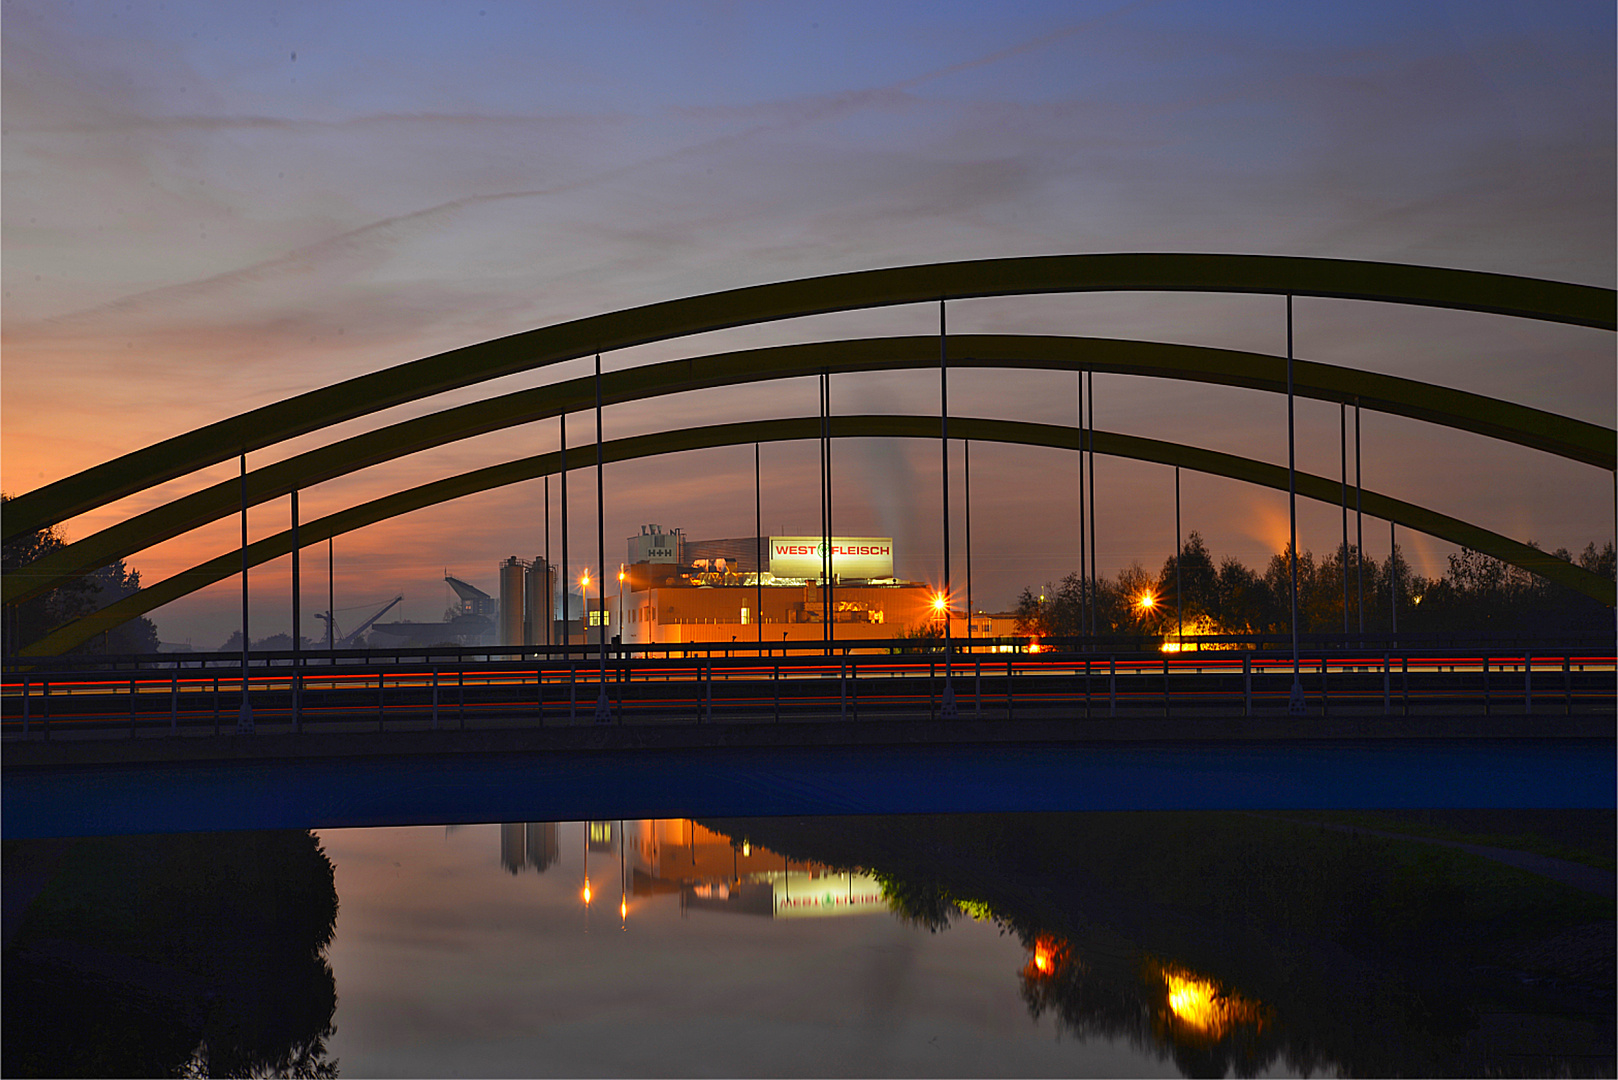 Brücke der A2 bei Uentrop